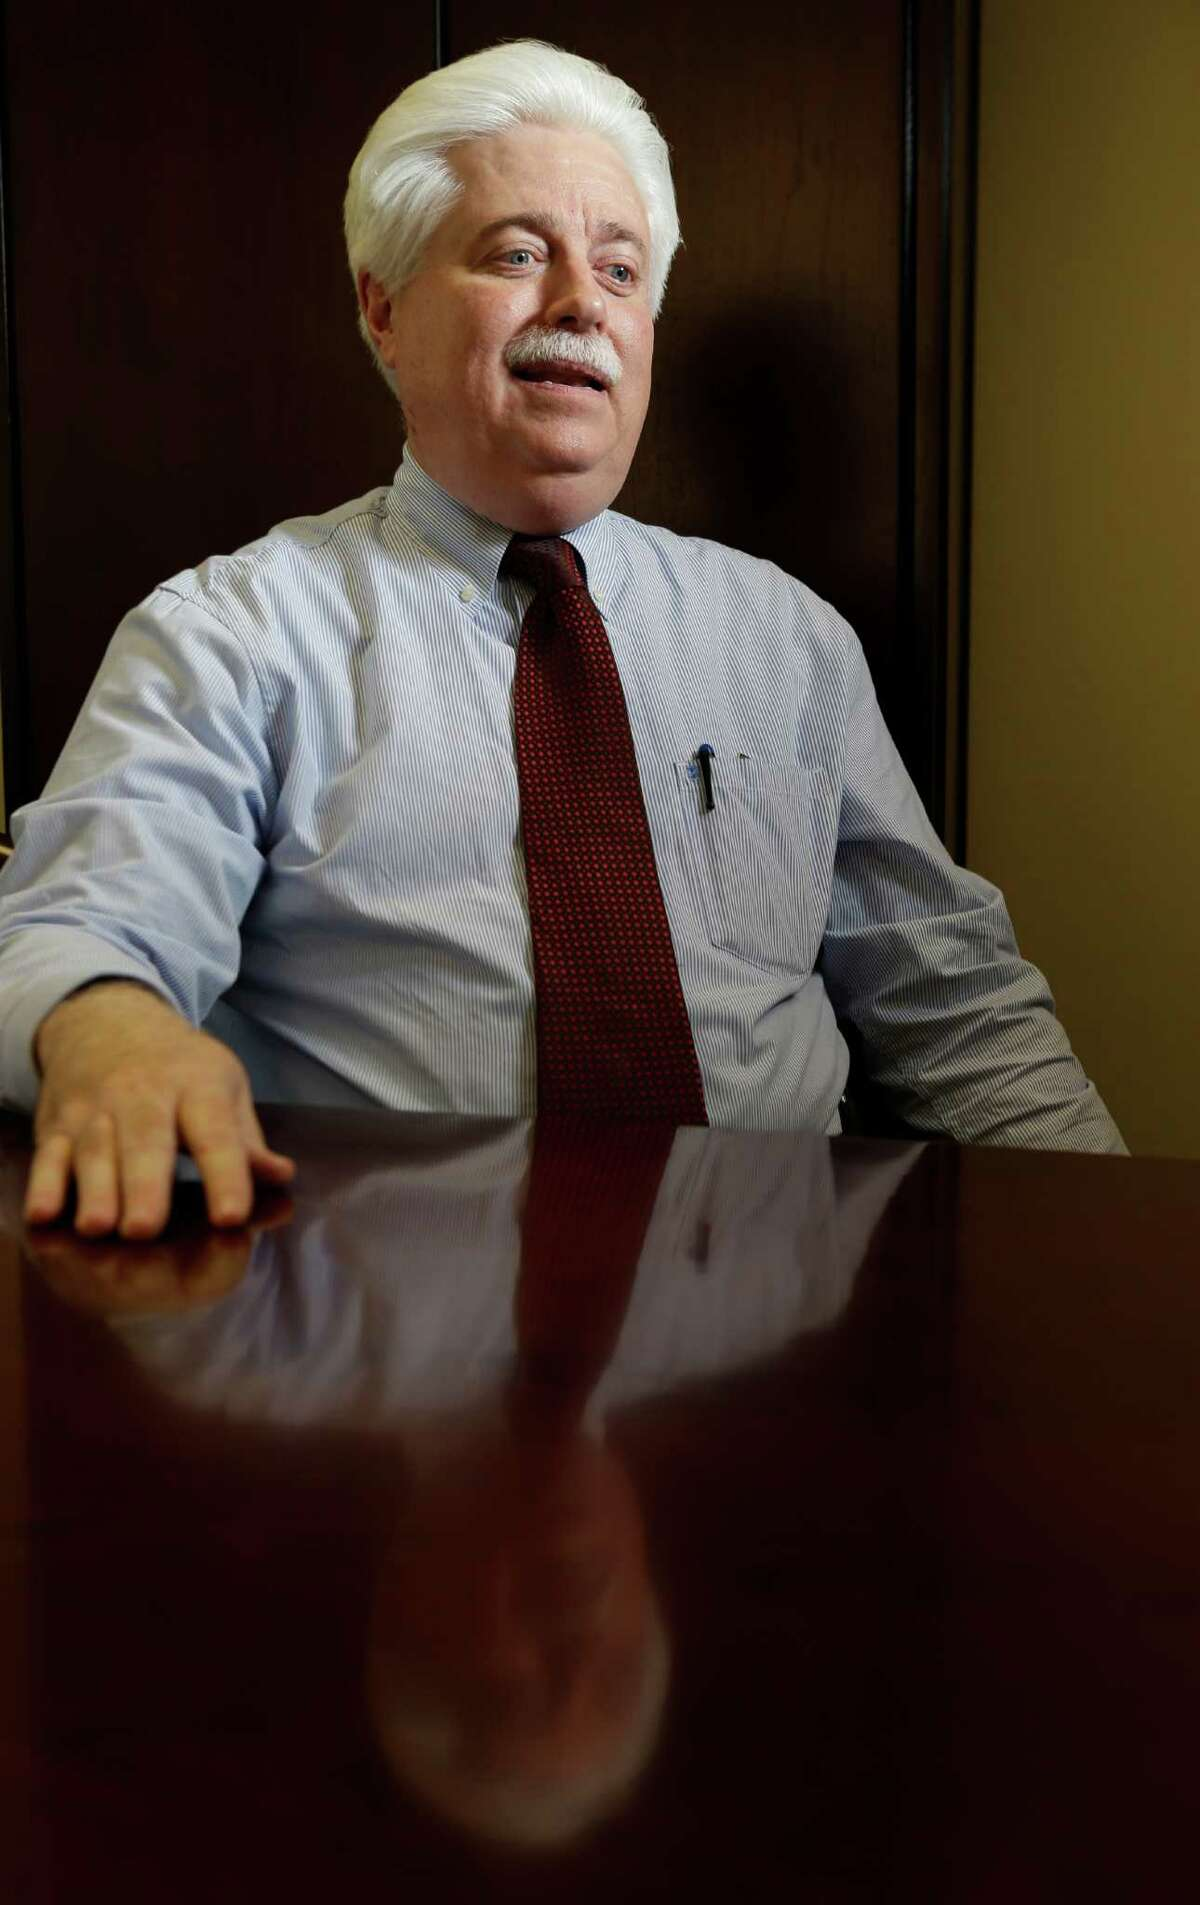 Stan Stanart, Harris County County Clerk, talks in his office at 201 Caroline Wednesday, Jan. 13, 2016, in Houston.